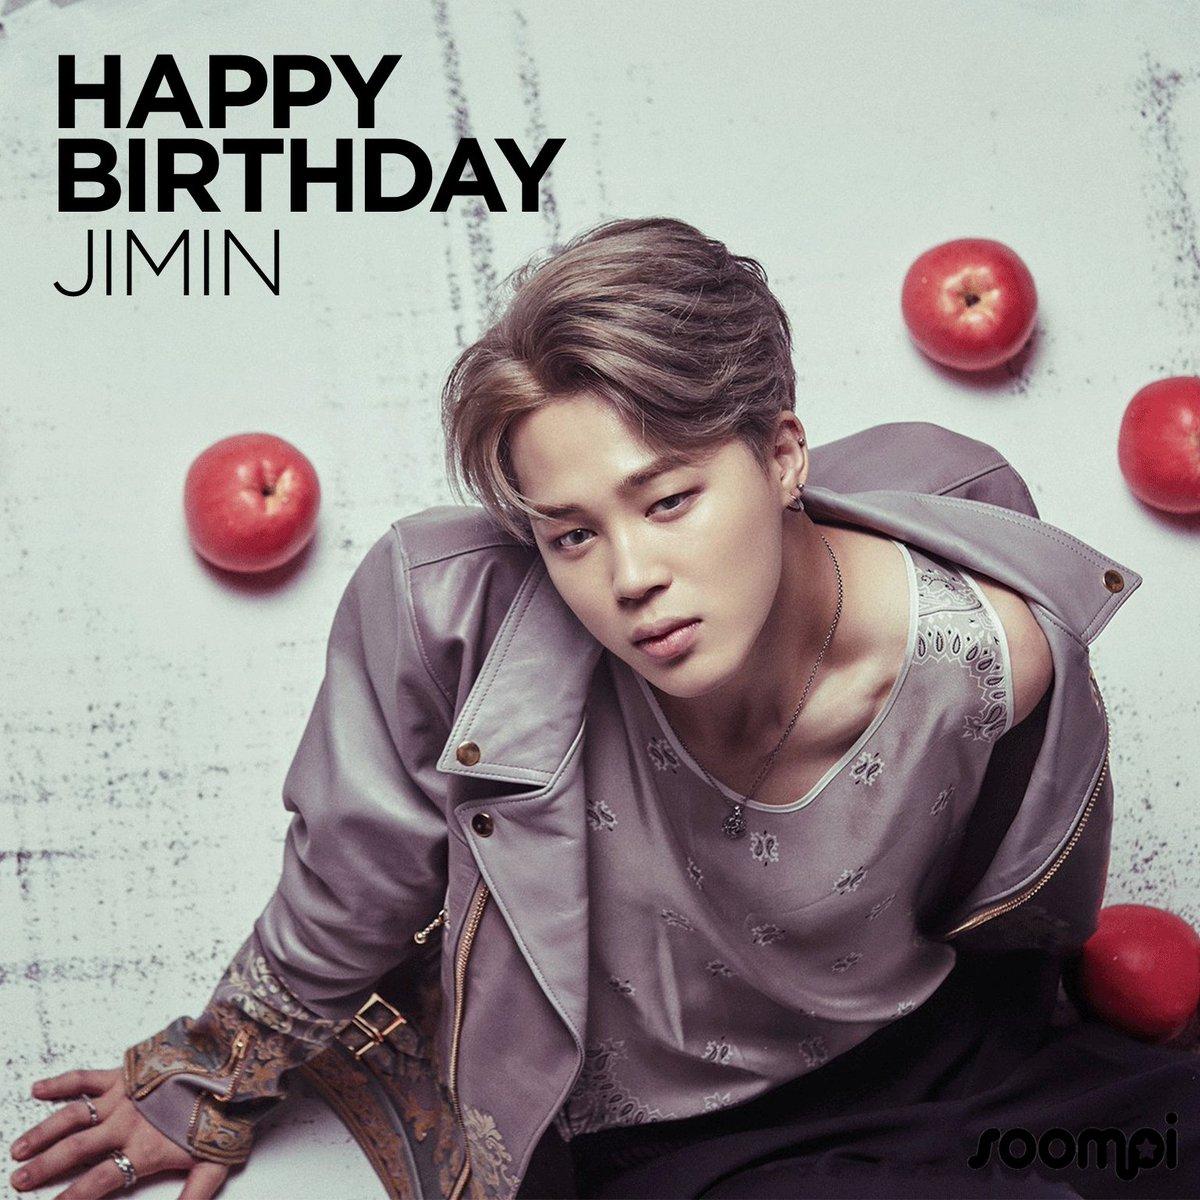 Happy Birthday to #BTS's Jimin! #HappyJiminDay #HappyJMDay https://t.co/XSSHat8MSI https://t.co/iqqh7AhRqW